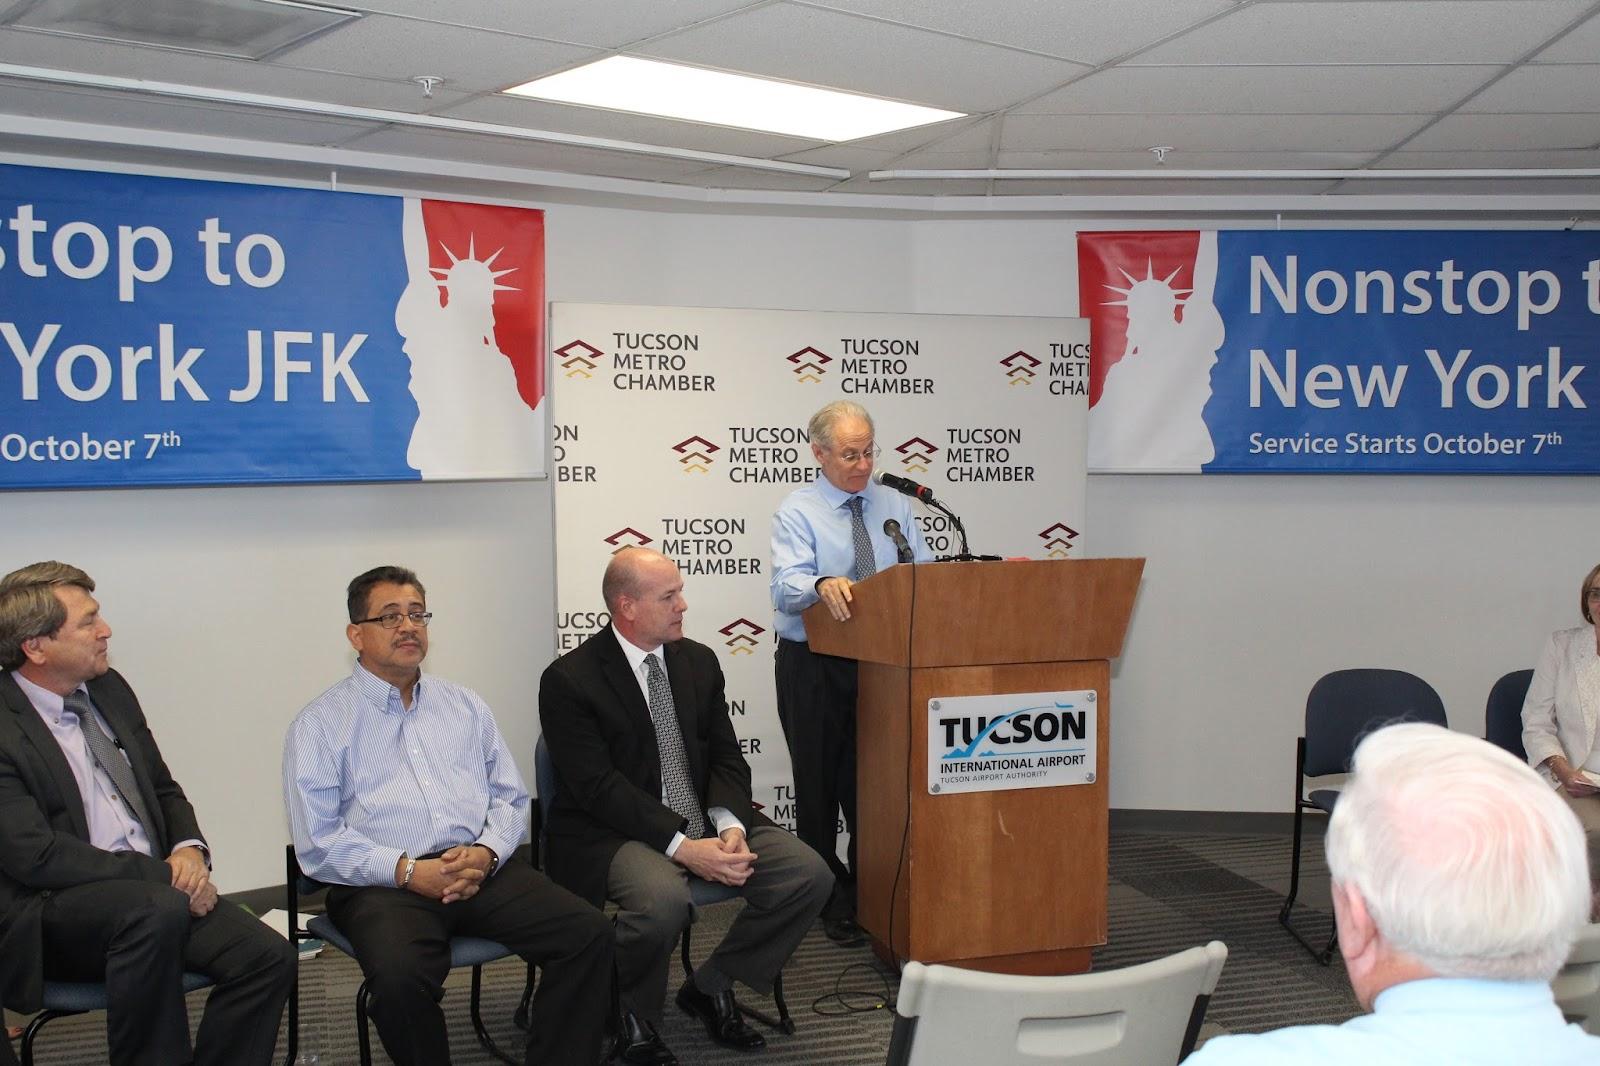 Tucson - JFK Non-Stop Route Announcement - IMG_3206.JPG